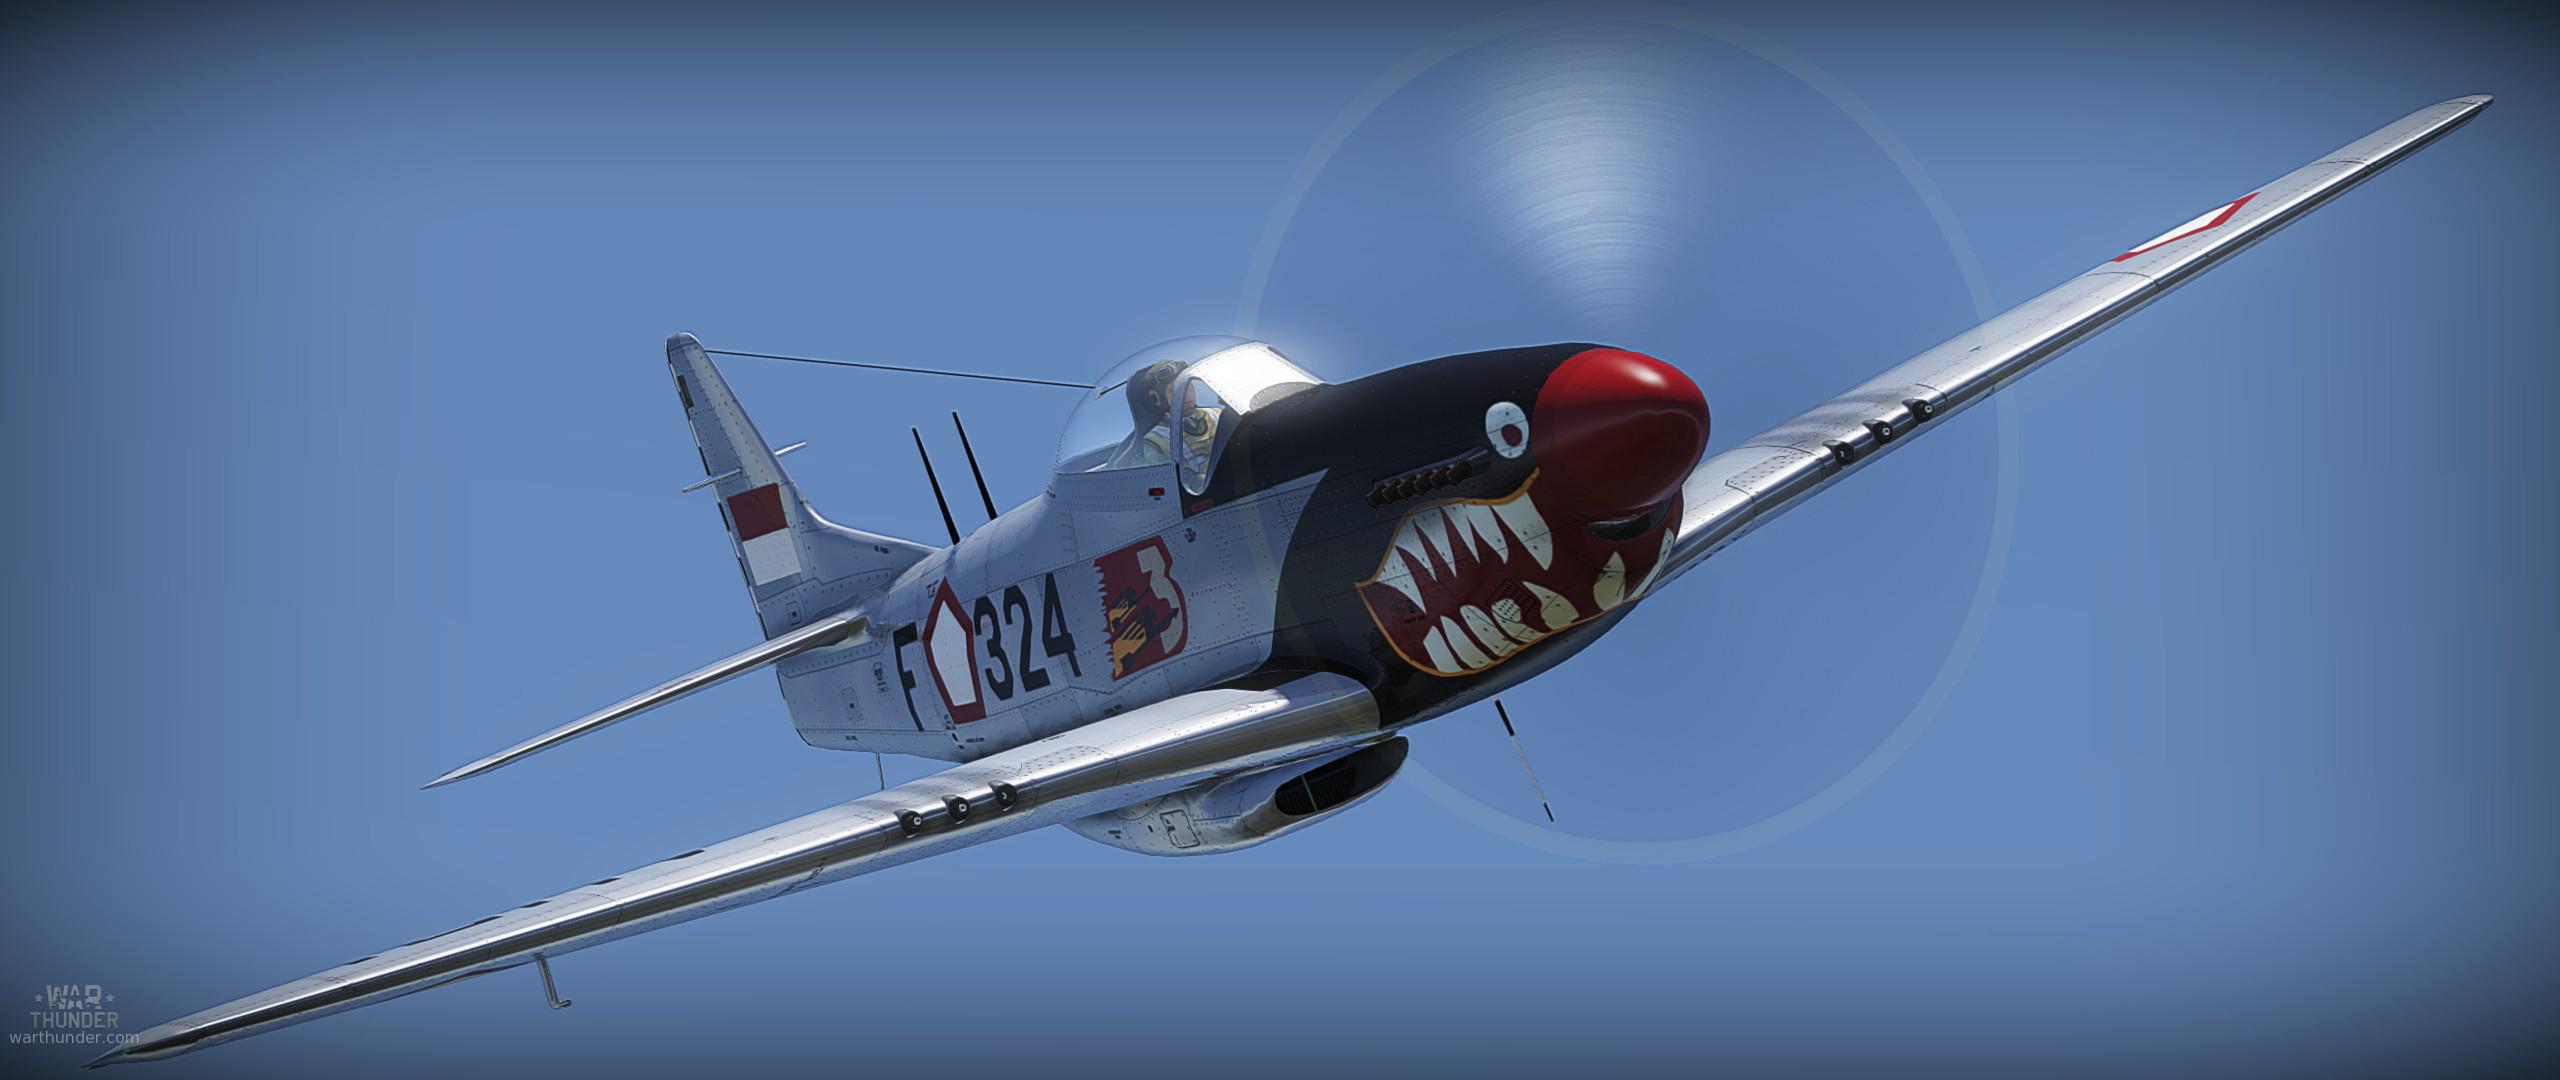 Air Forces] Indonesian Air Force - News - War Thunder